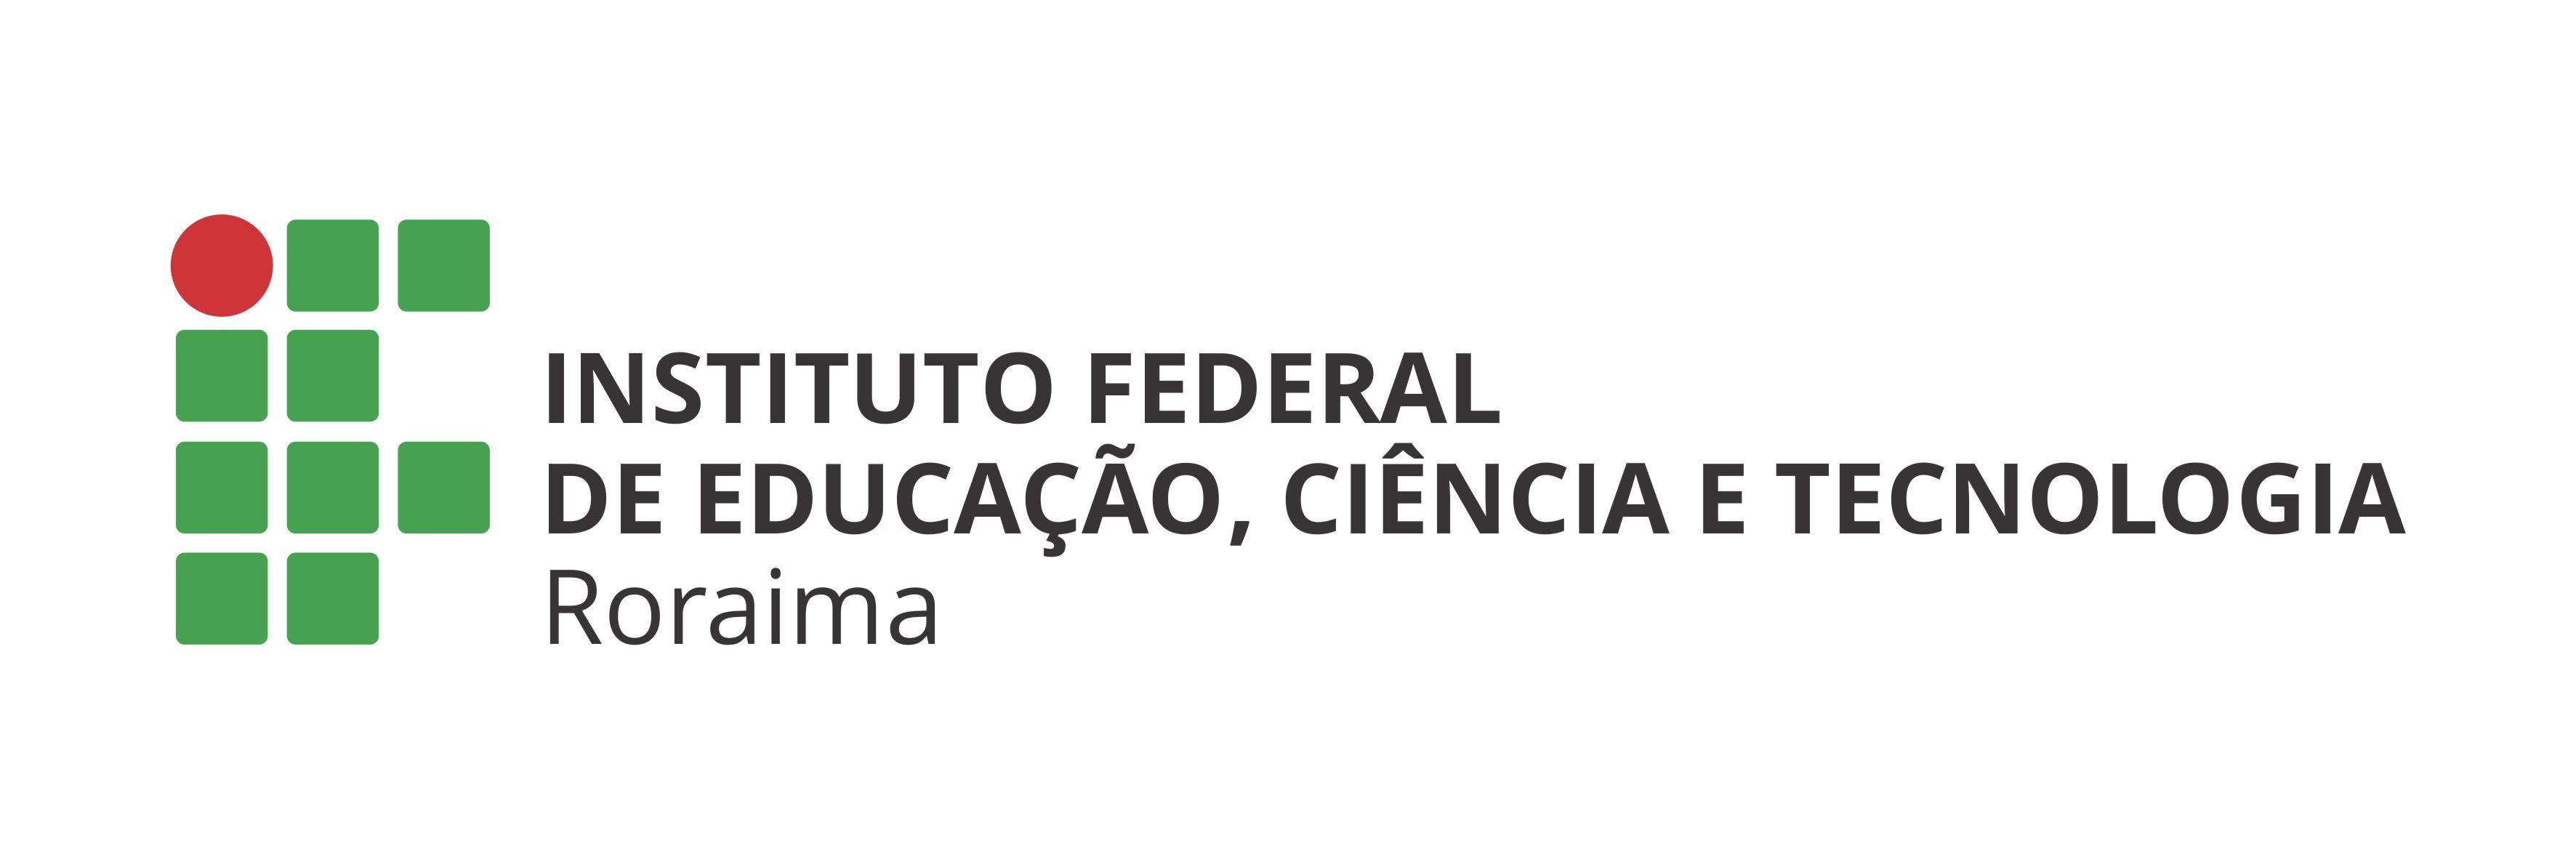 Instituto Federal de Roraima